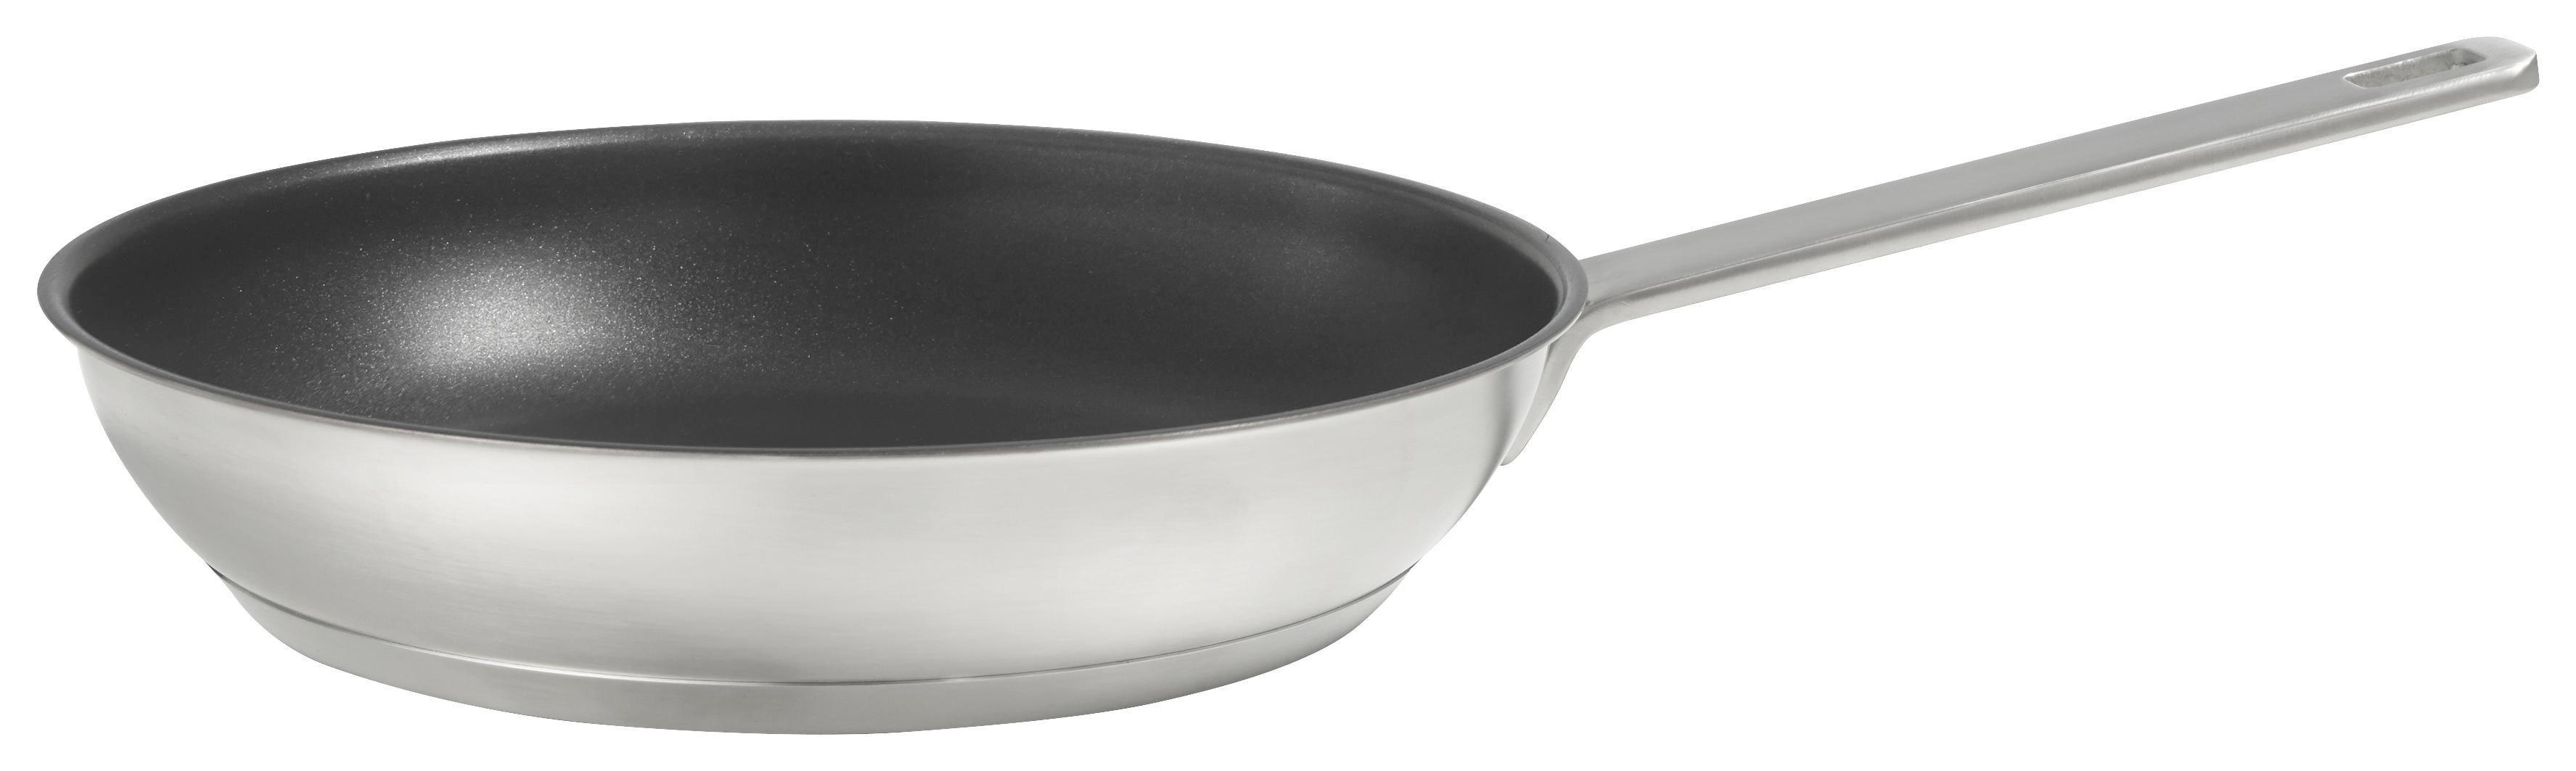 BRATPFANNE 28 cm Teflon® Platinum-Antihaftbeschichtung - Schwarz, Basics, Metall (28cm) - HOMEWARE PROFESSION.